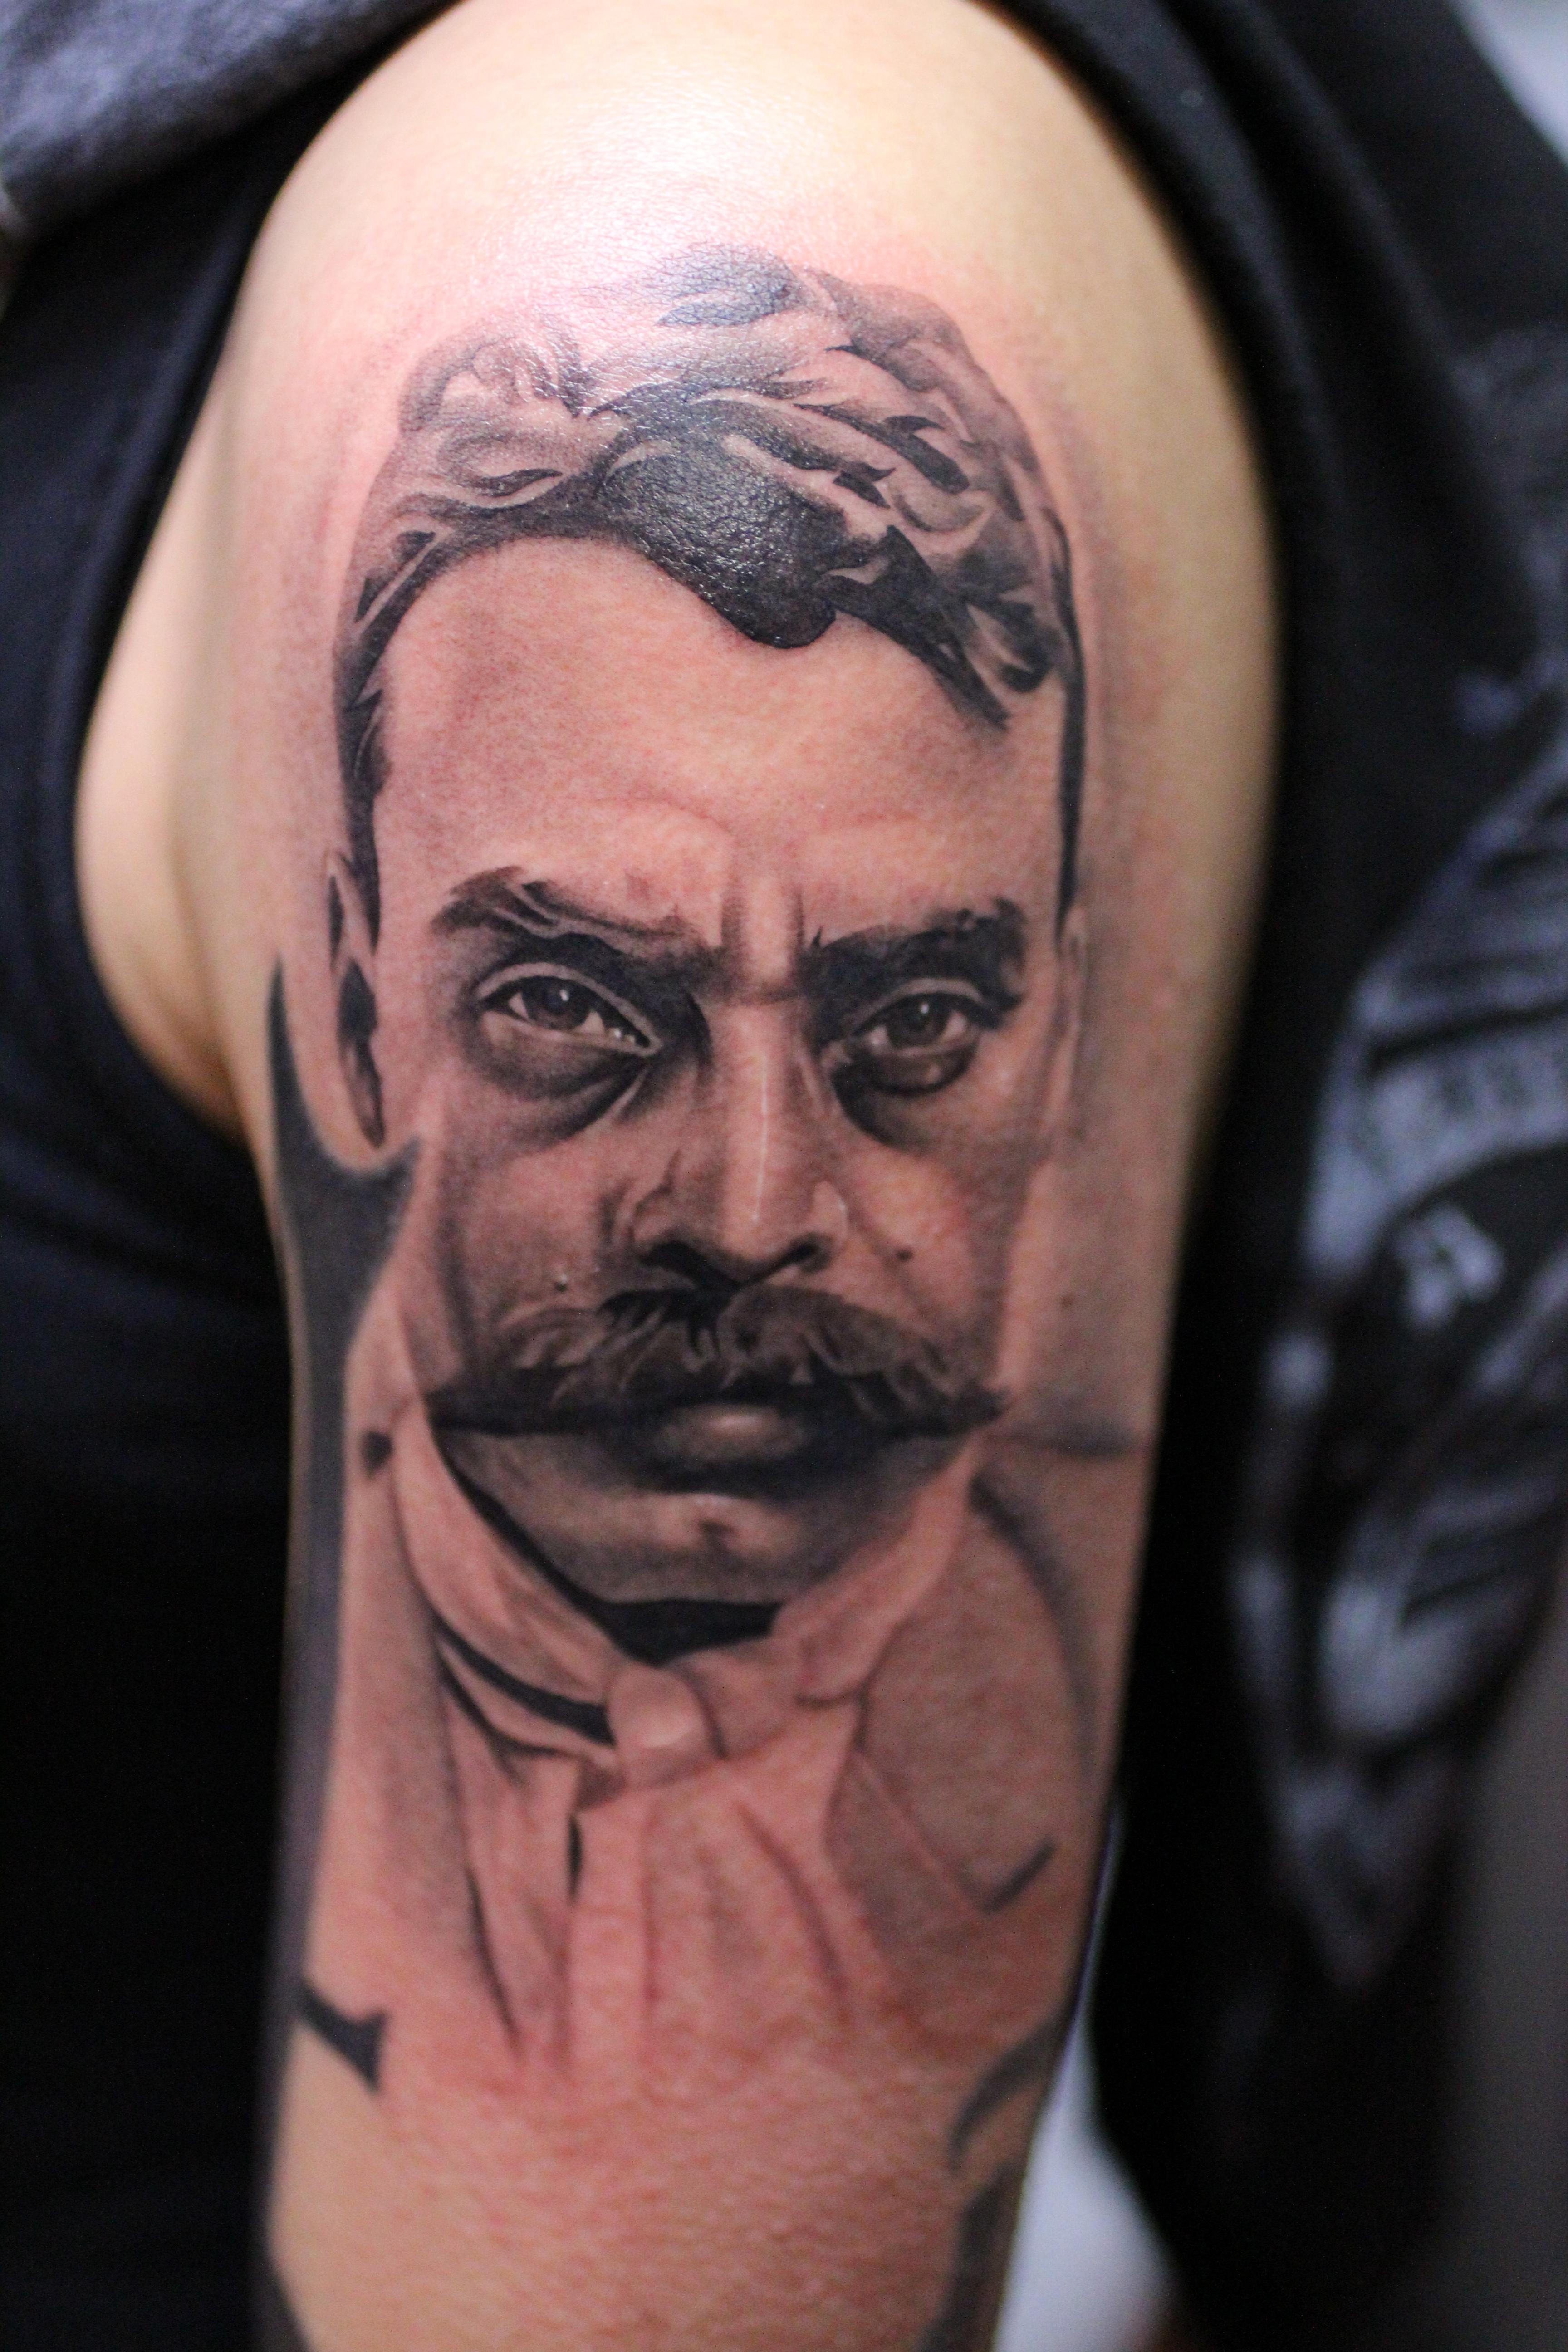 Bryangvargas american dream tattoo page 4 for Emiliano zapata tattoo